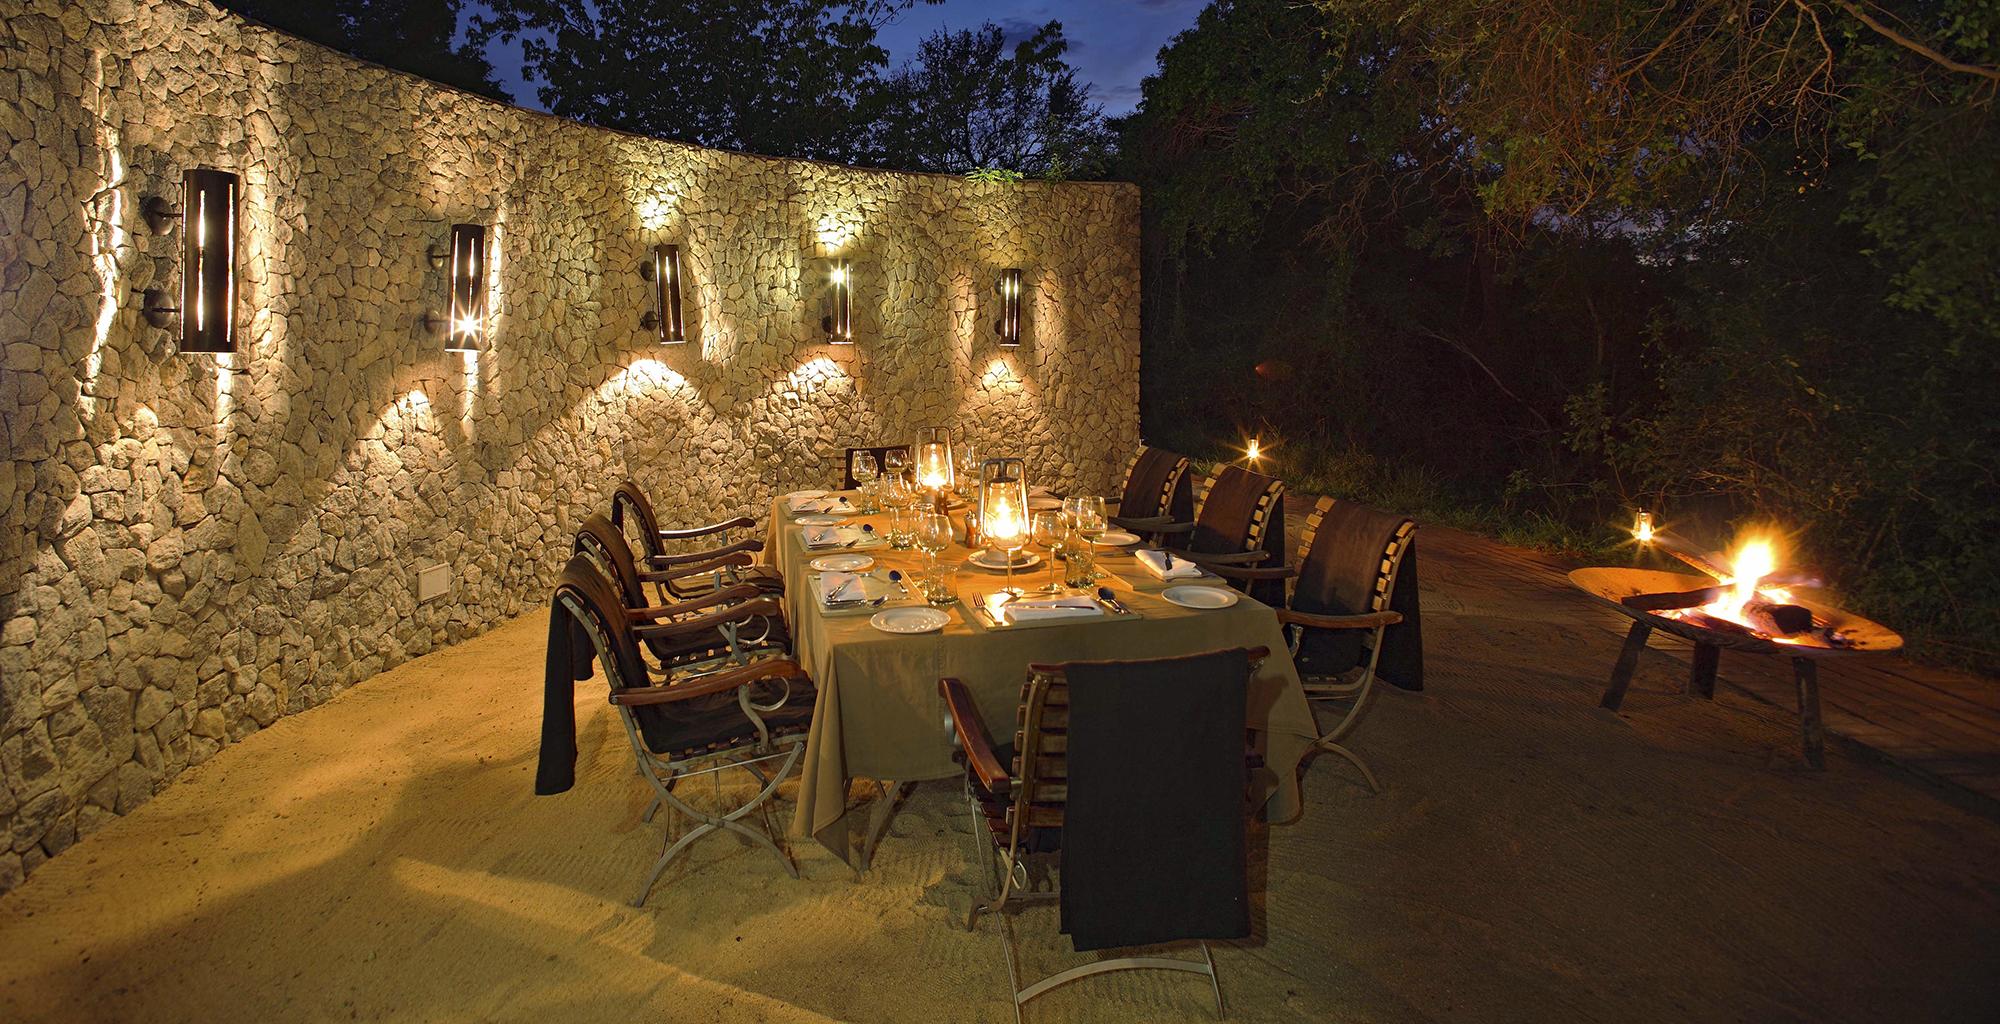 South-Africa-Dulini-Leadwood-Dining-Night